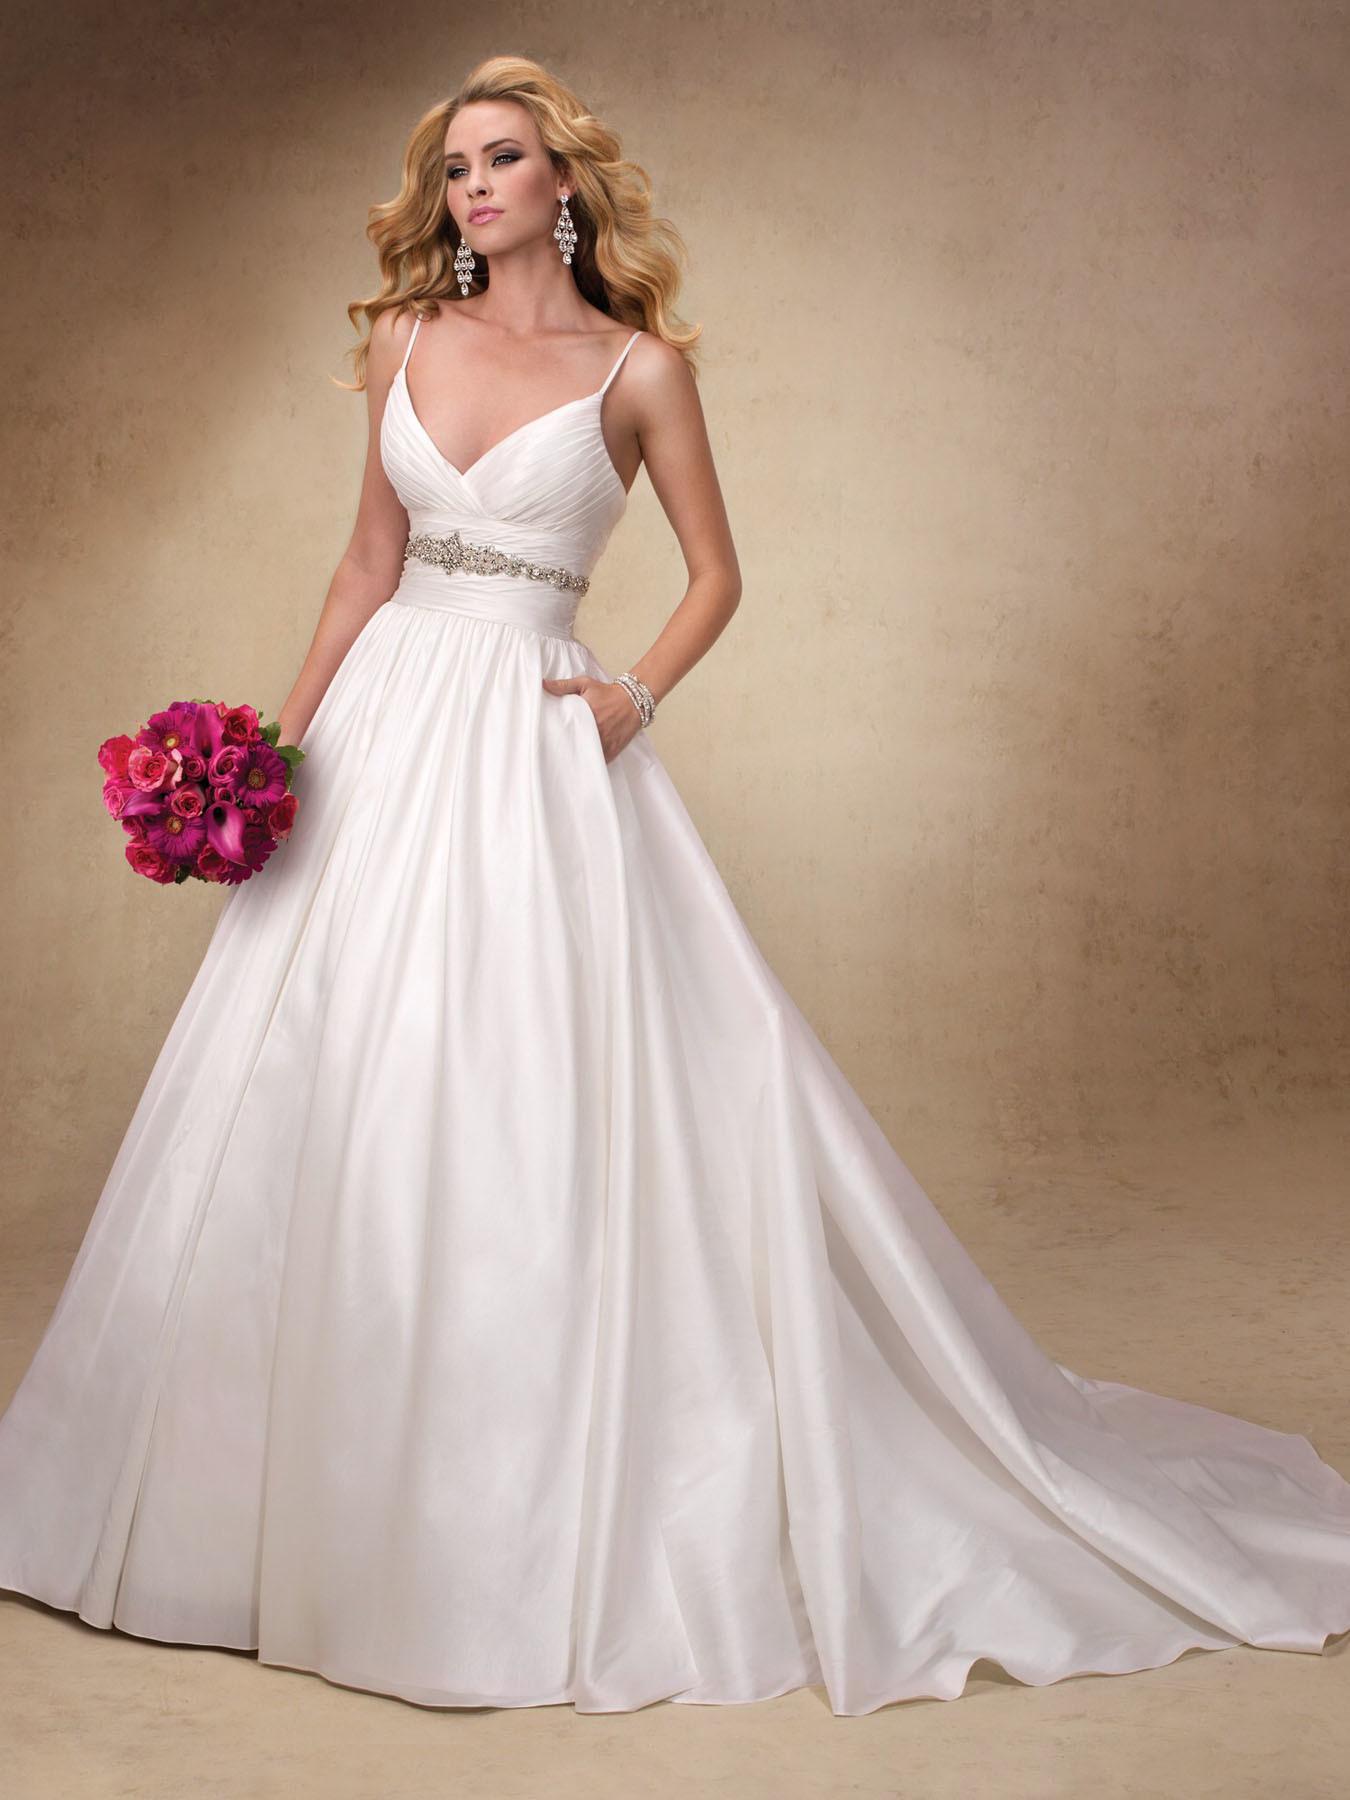 china white princess short prom dress wedding bridal dress